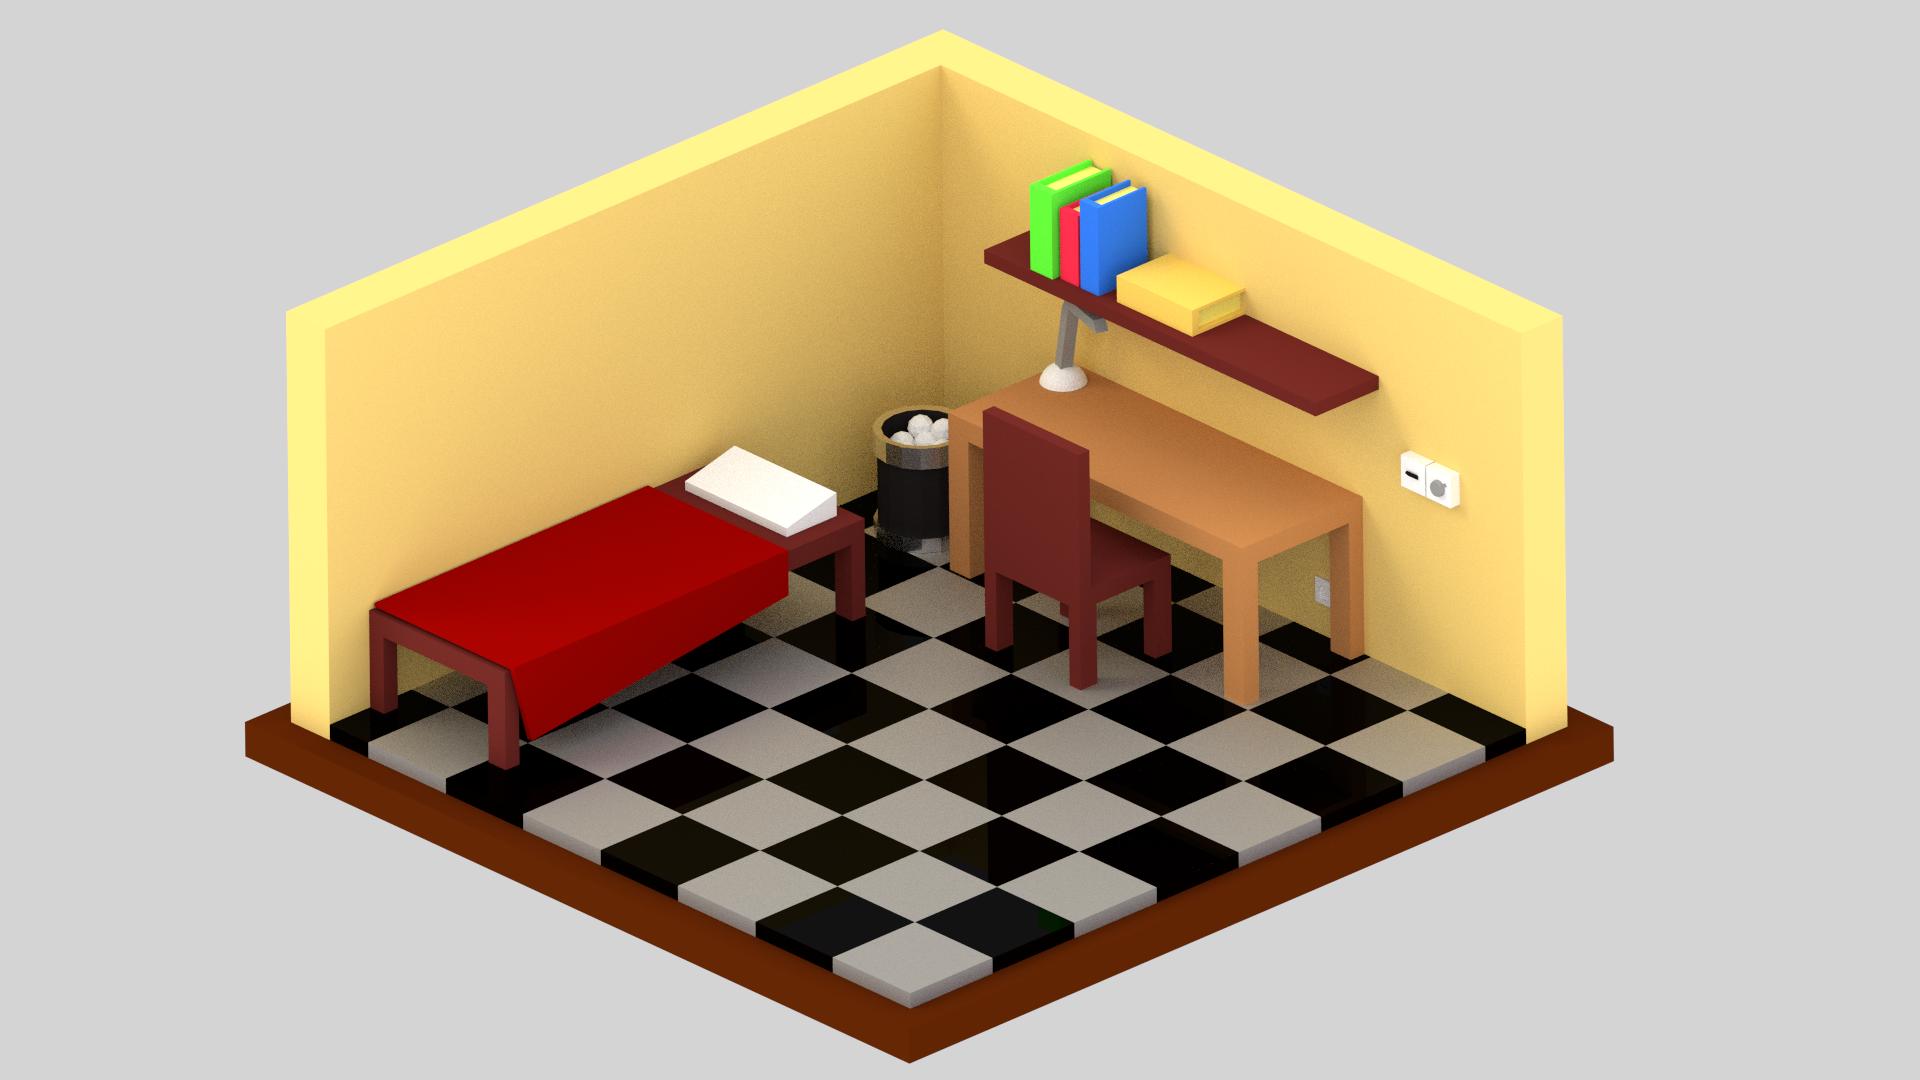 Little isometric room